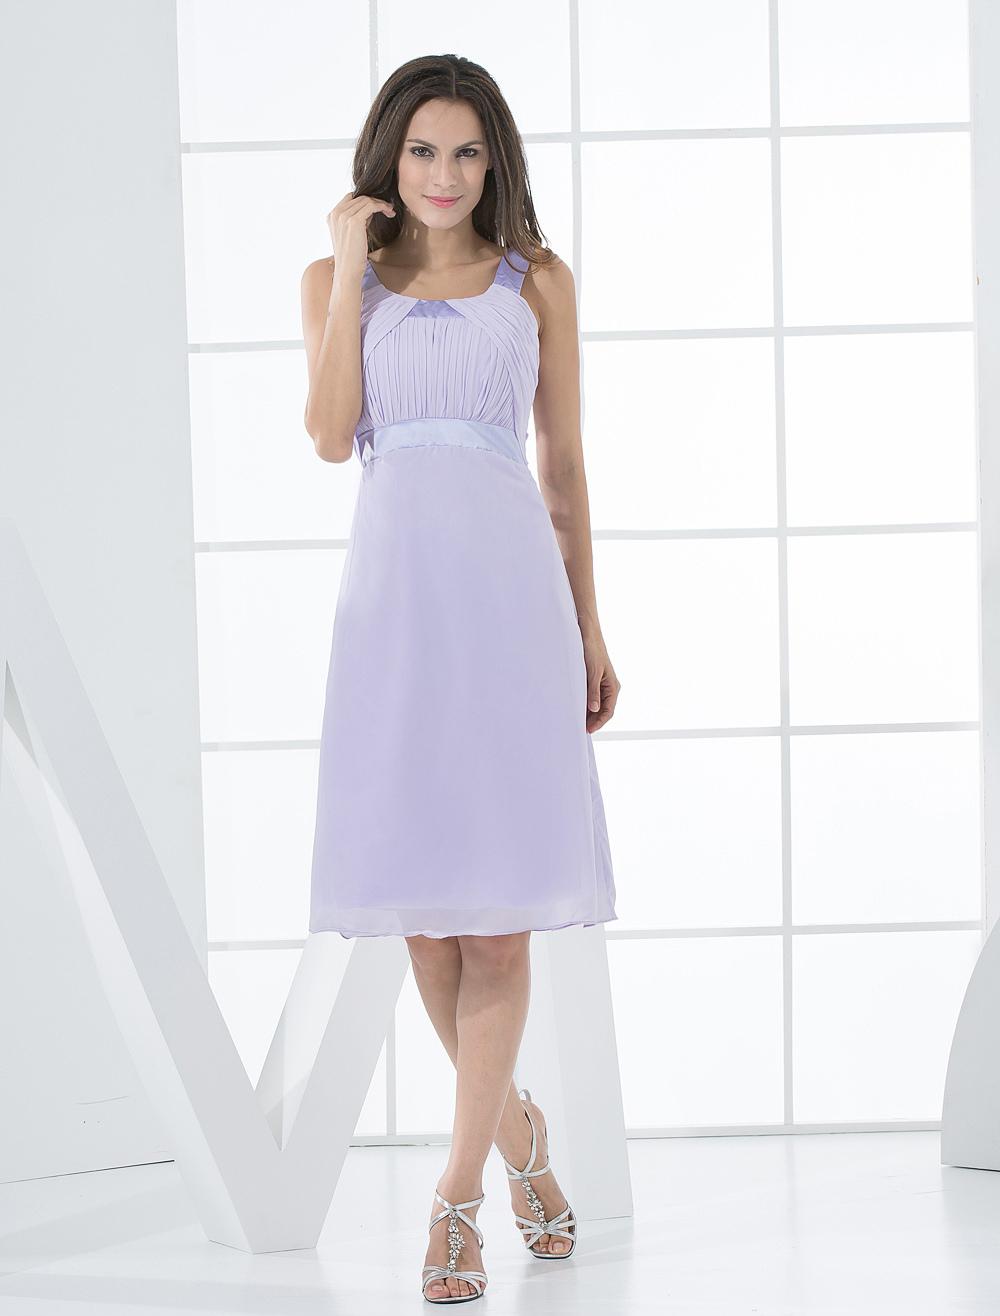 Elegant Sleeveless Empire Waist Satin Chiffon Summer Cocktail Dress